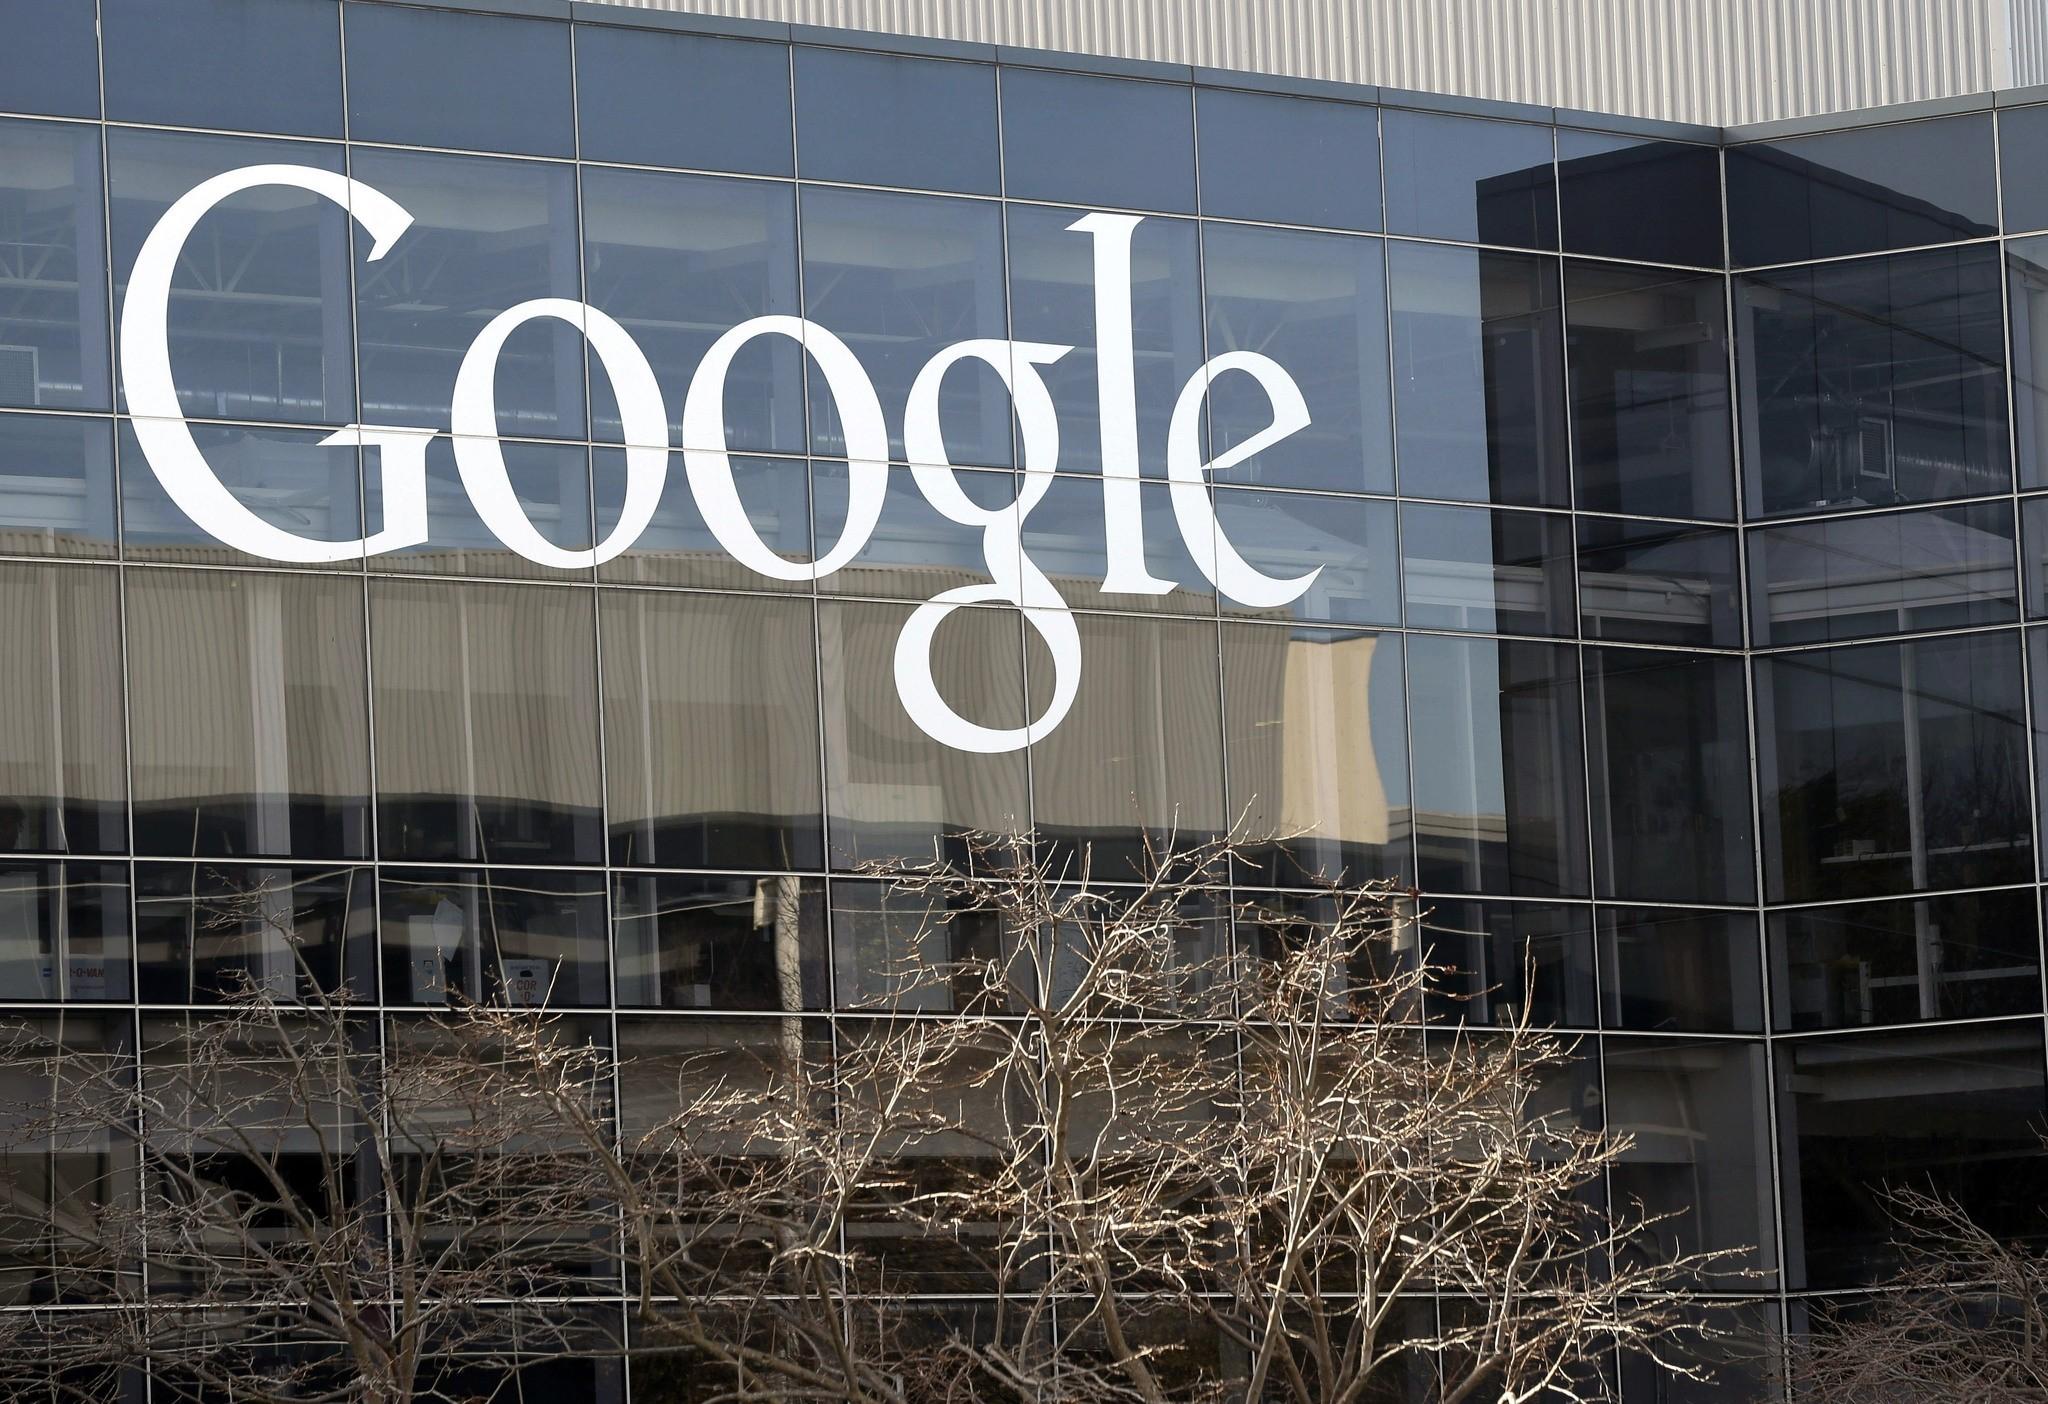 Google's headquarters in Mountain View, Calif. Alphabet Inc. (AP Photo)